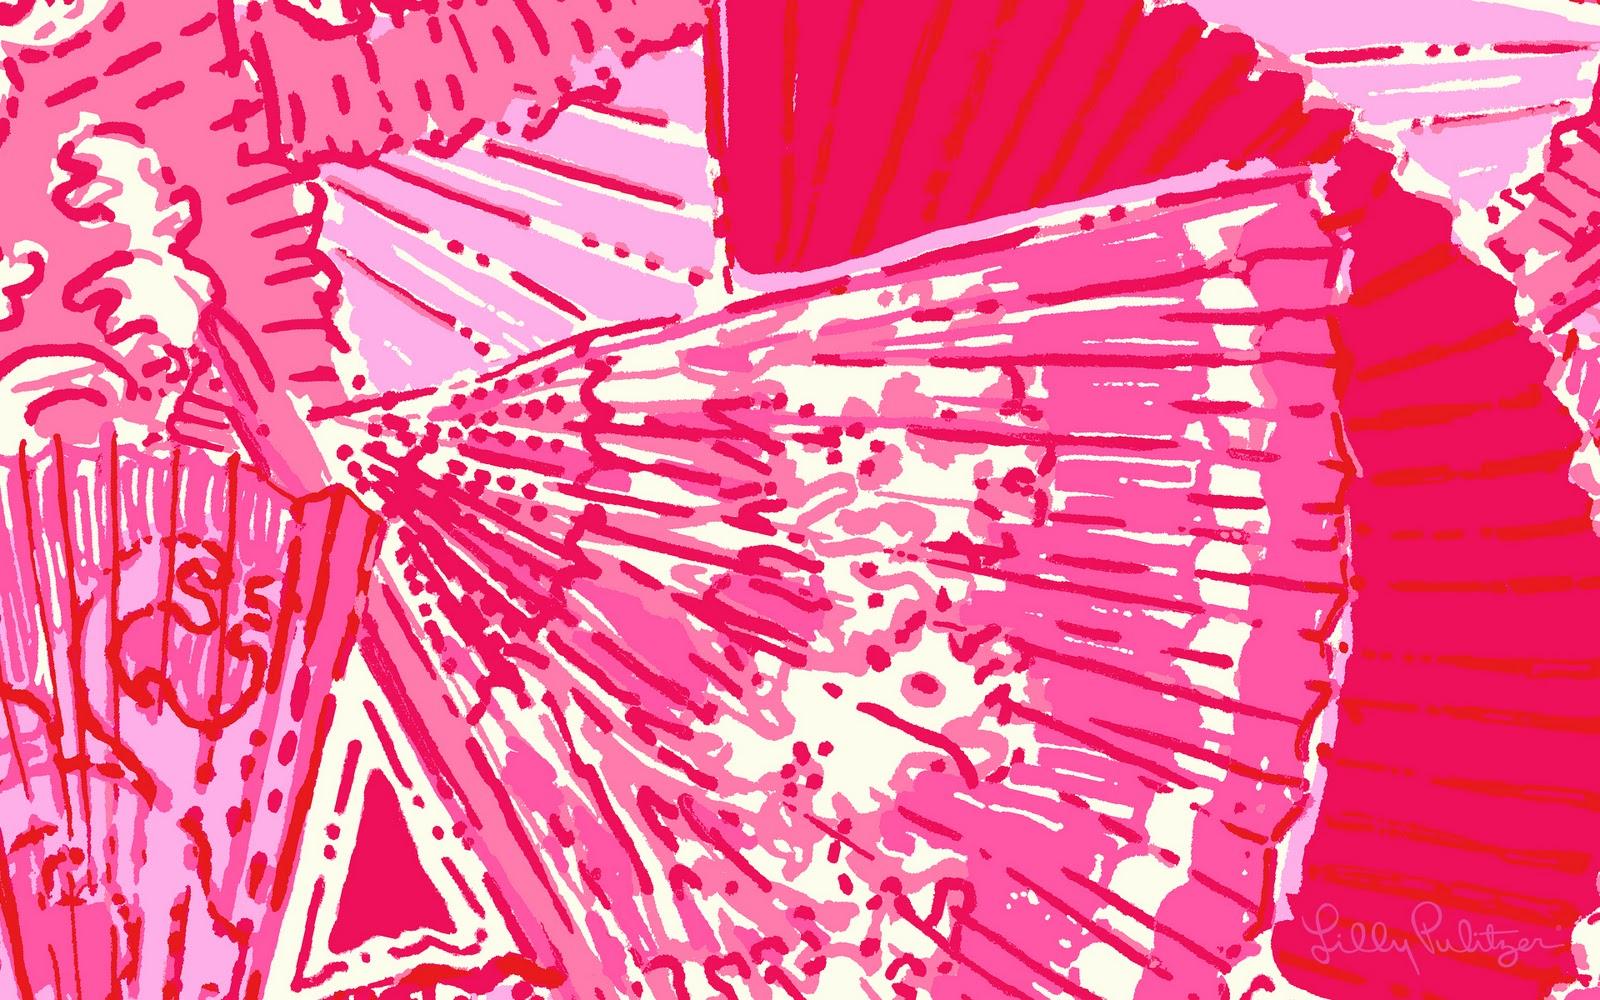 CanadianPrep-Lilly-Desktop-wallpaper-wp5002632